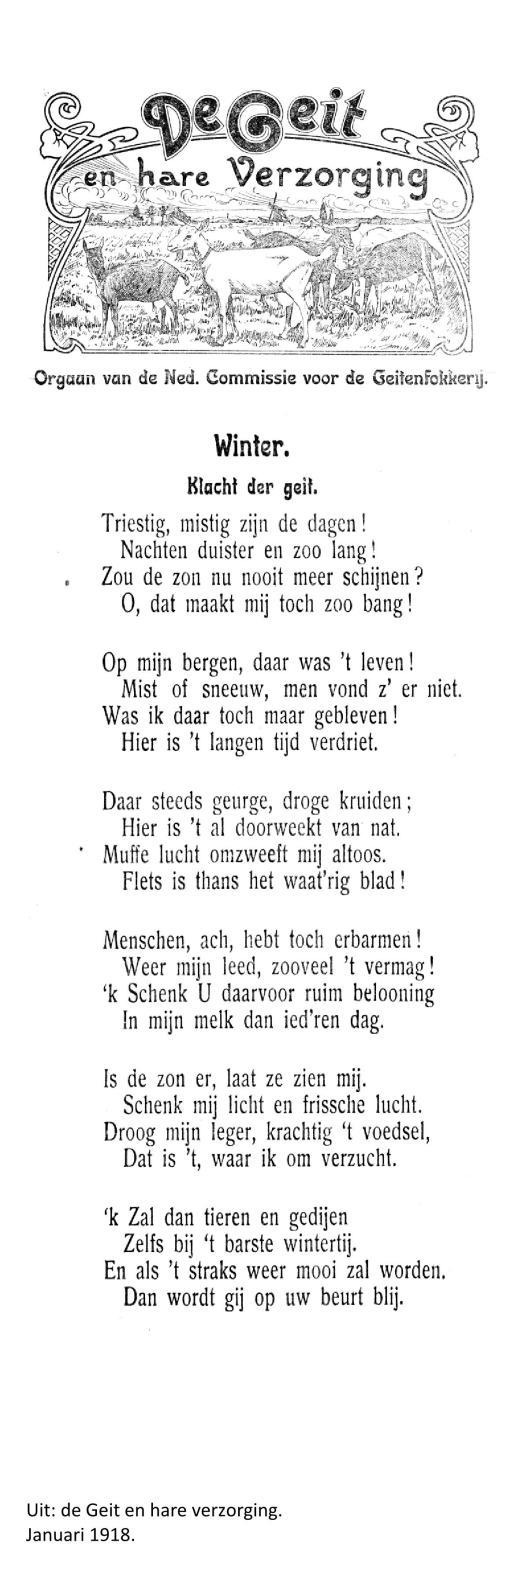 Weblog; Januari 1918 gedicht